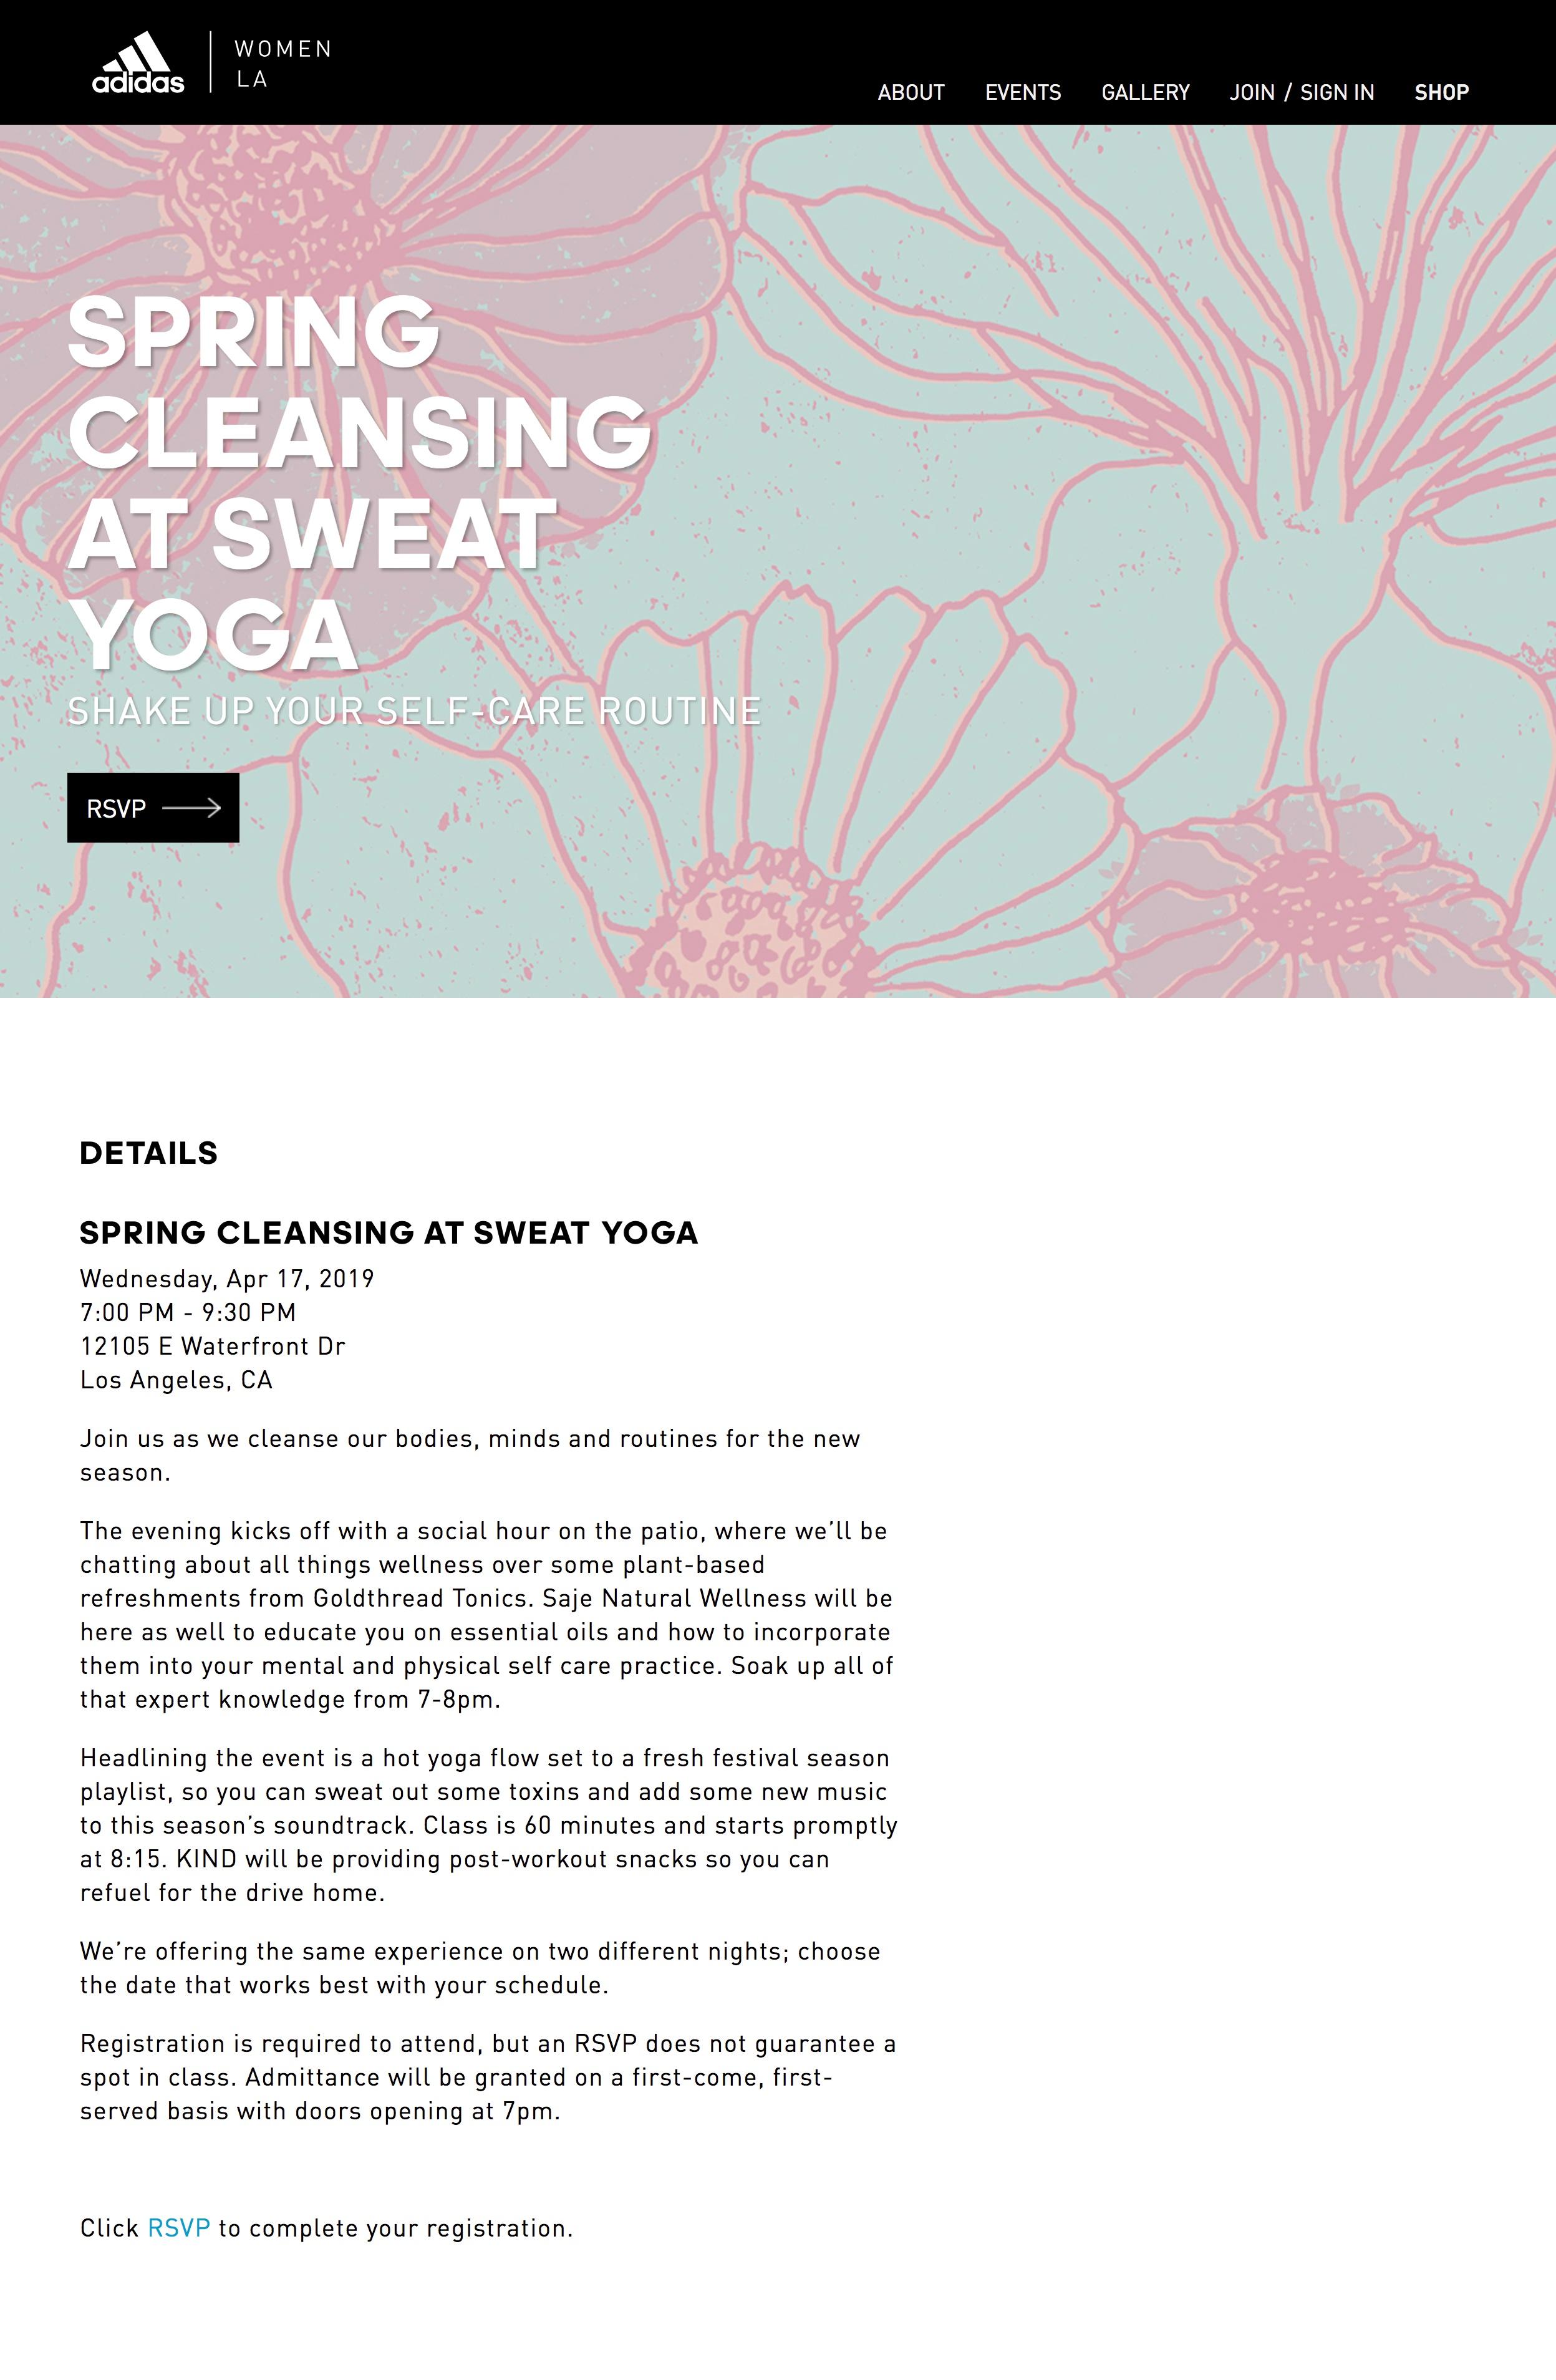 screencapture-adidaswomenla-event-sweat-yoga17-2019-04-15-14_18_31.png